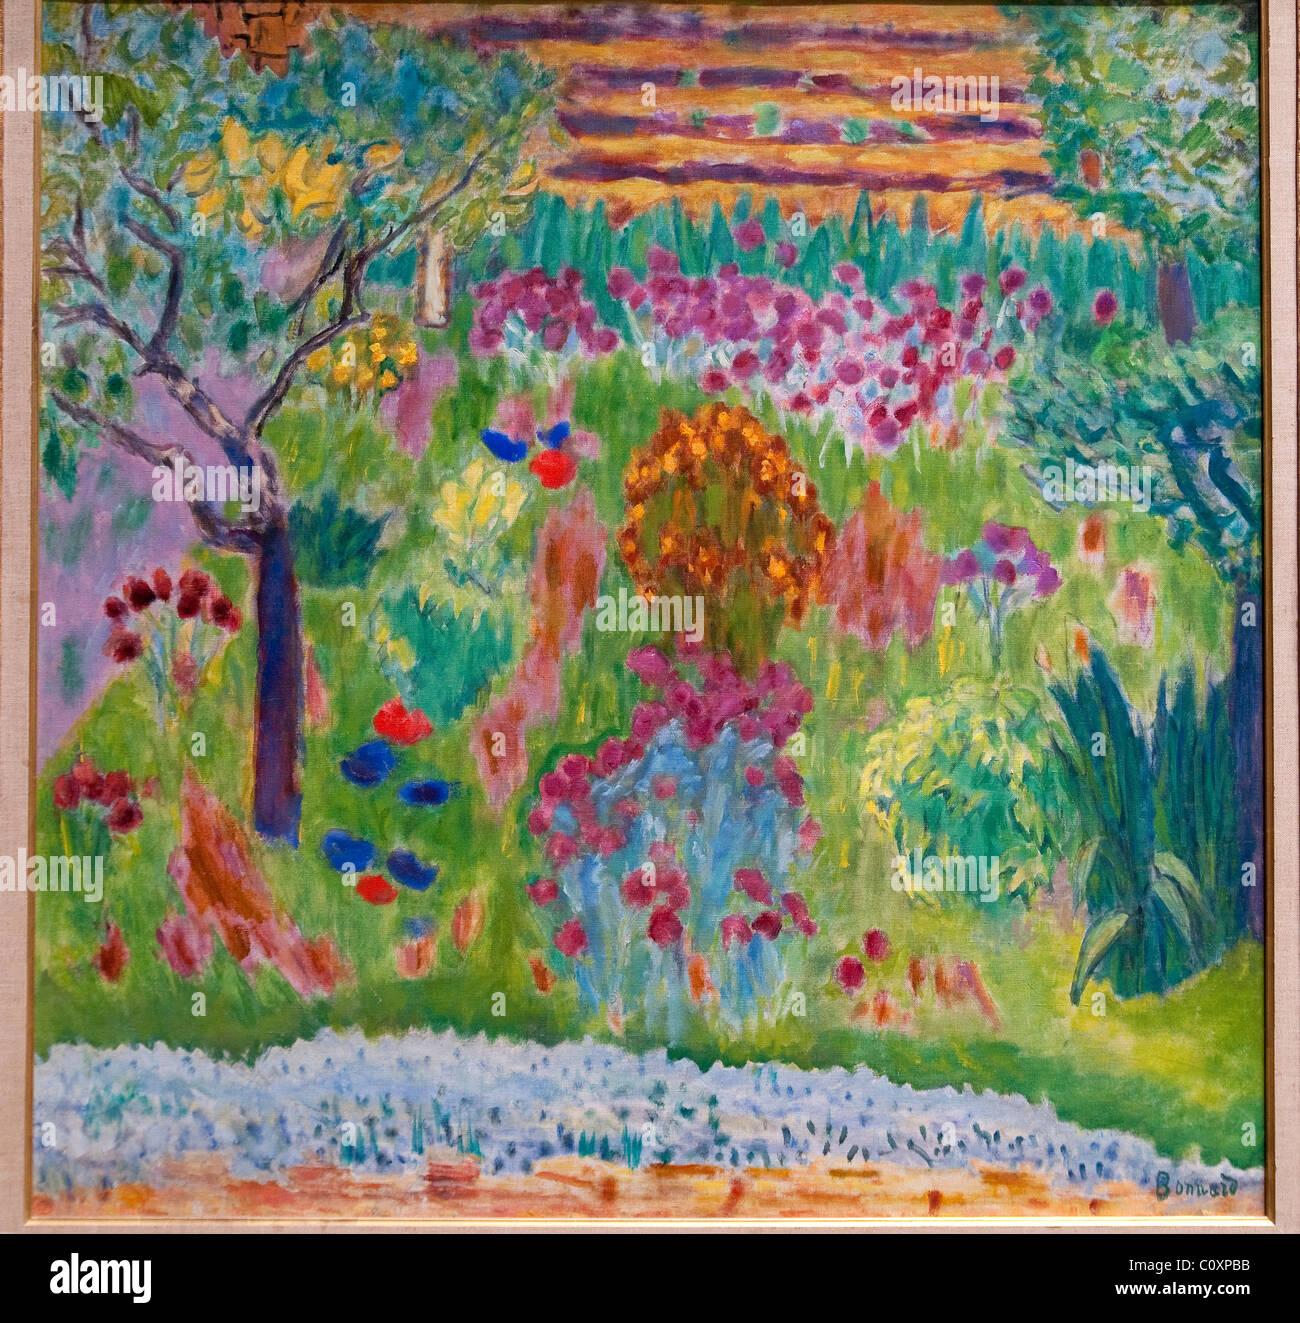 Garden, ca. 1935, by Pierre Bonnard, - Stock Image